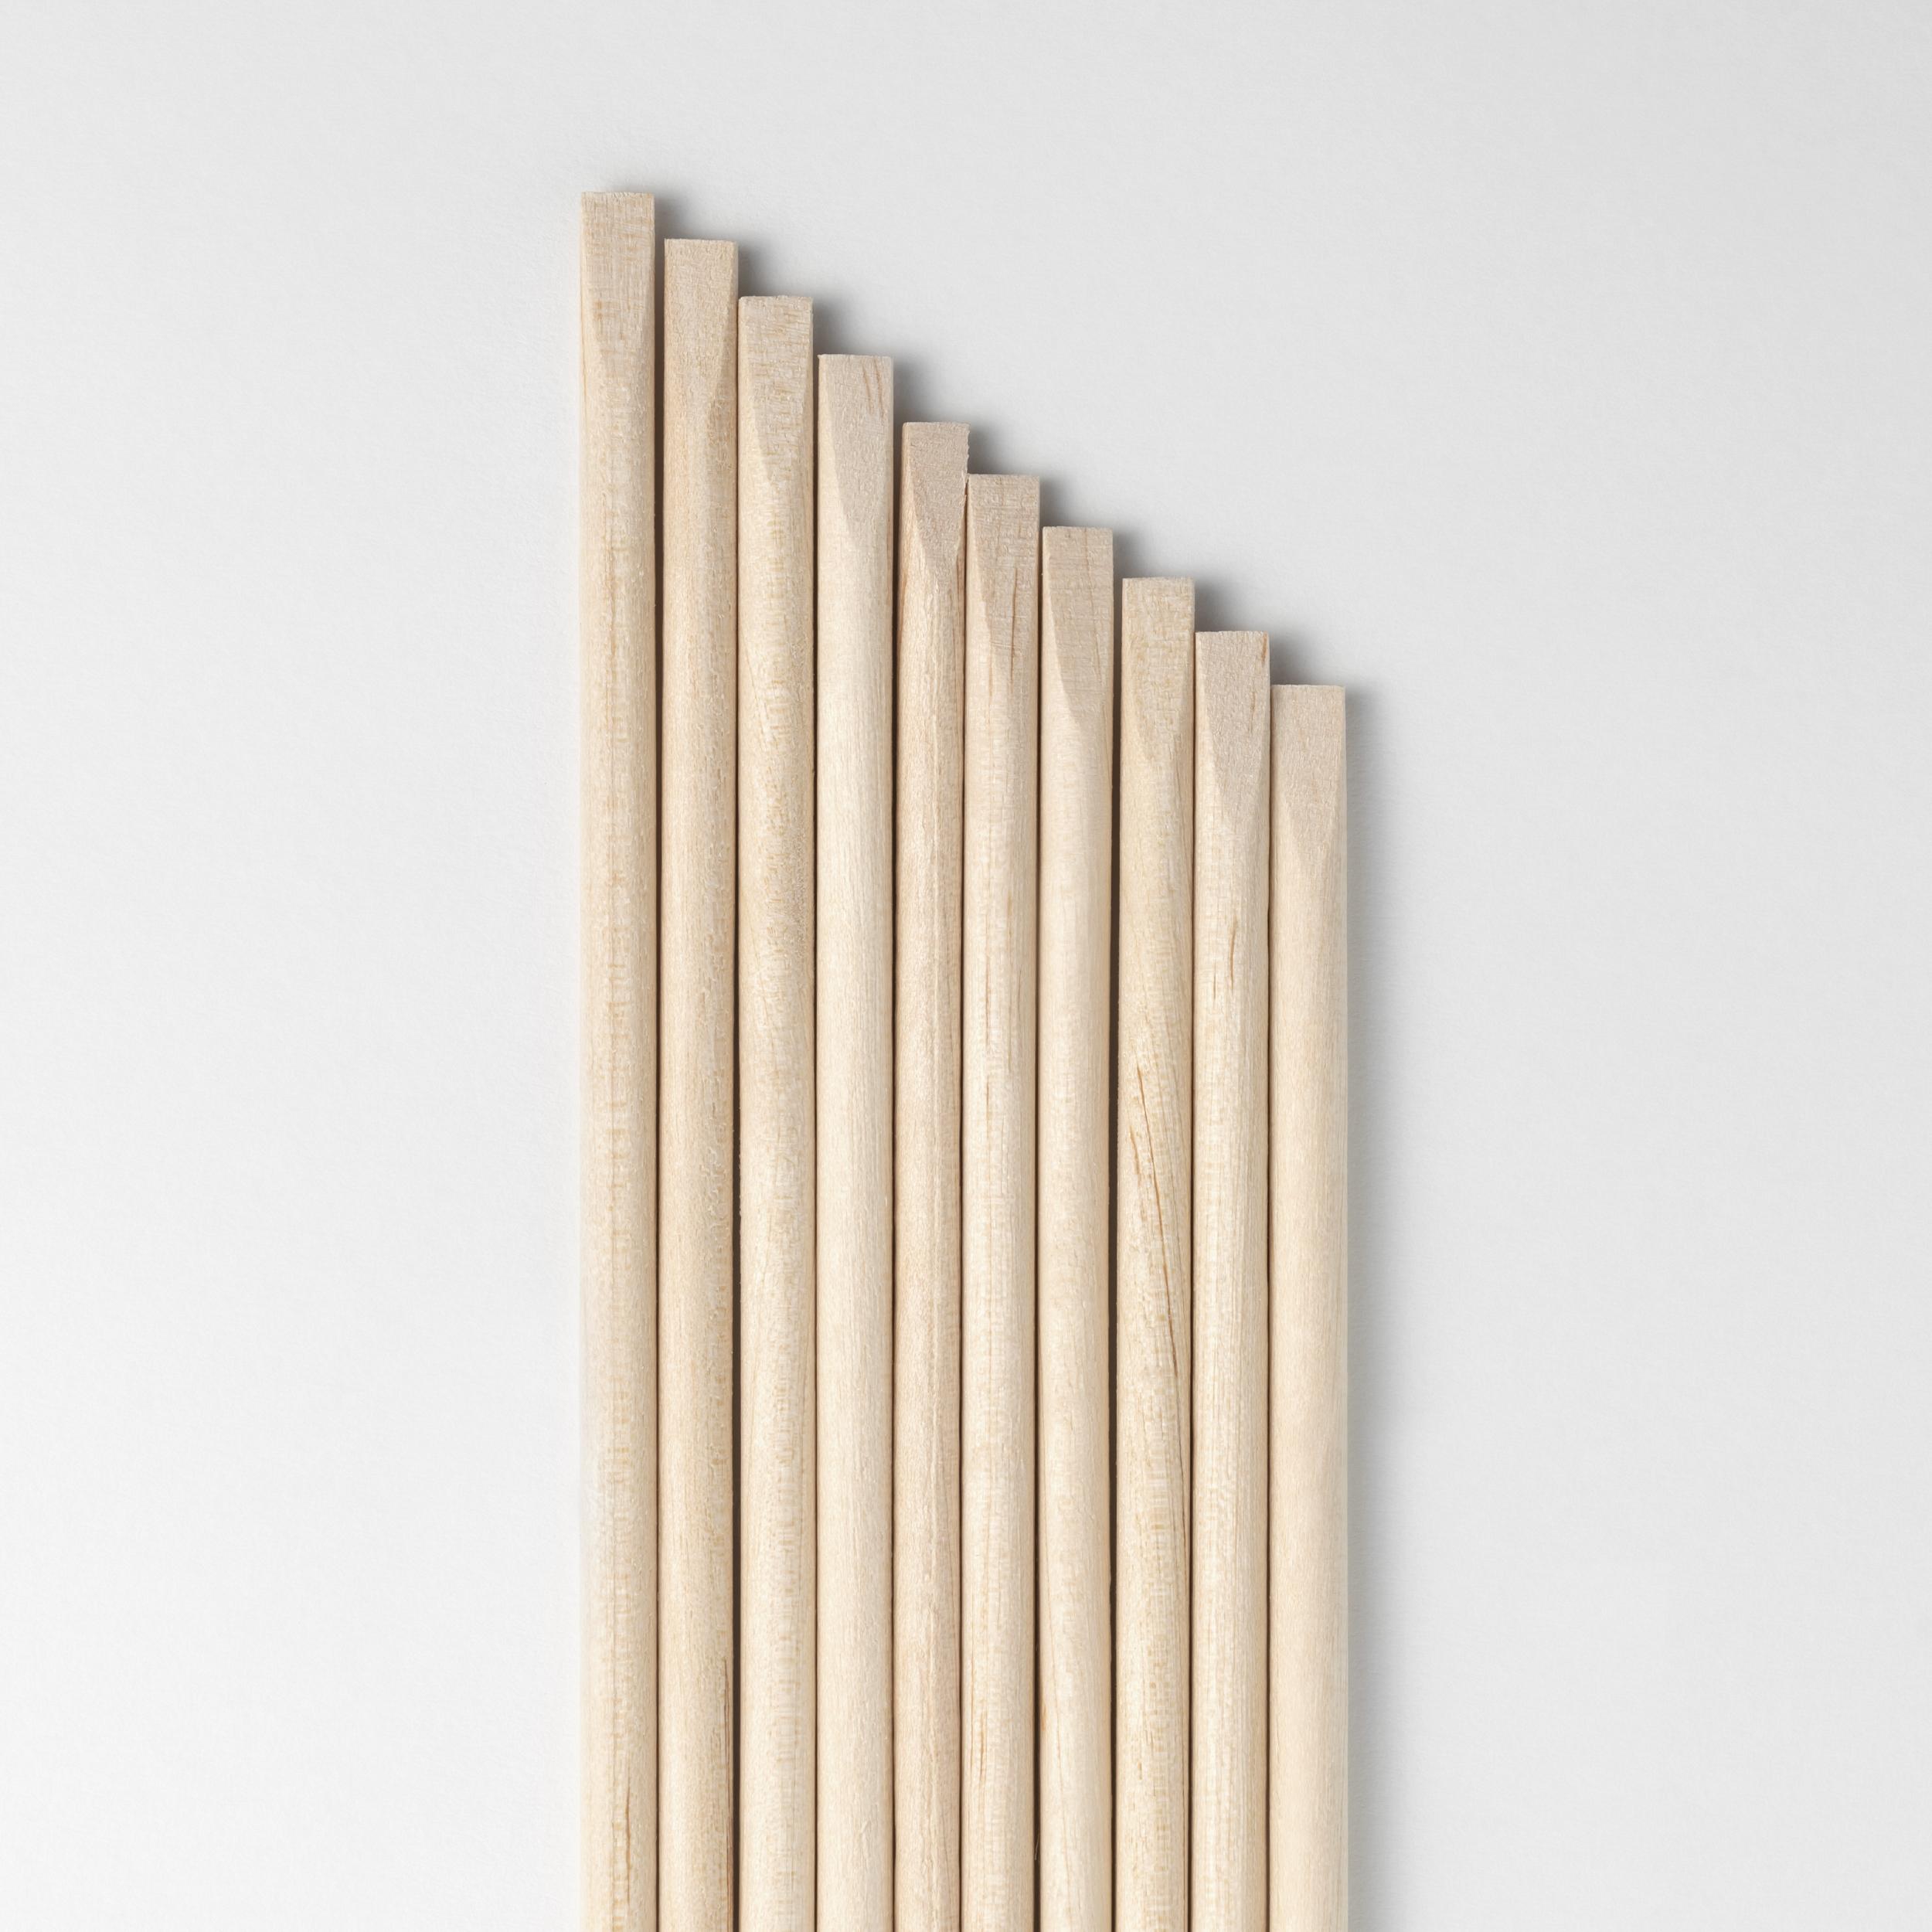 Gel Nail Wood Stick ジェルネイル ウッドスティック 10本セット画像